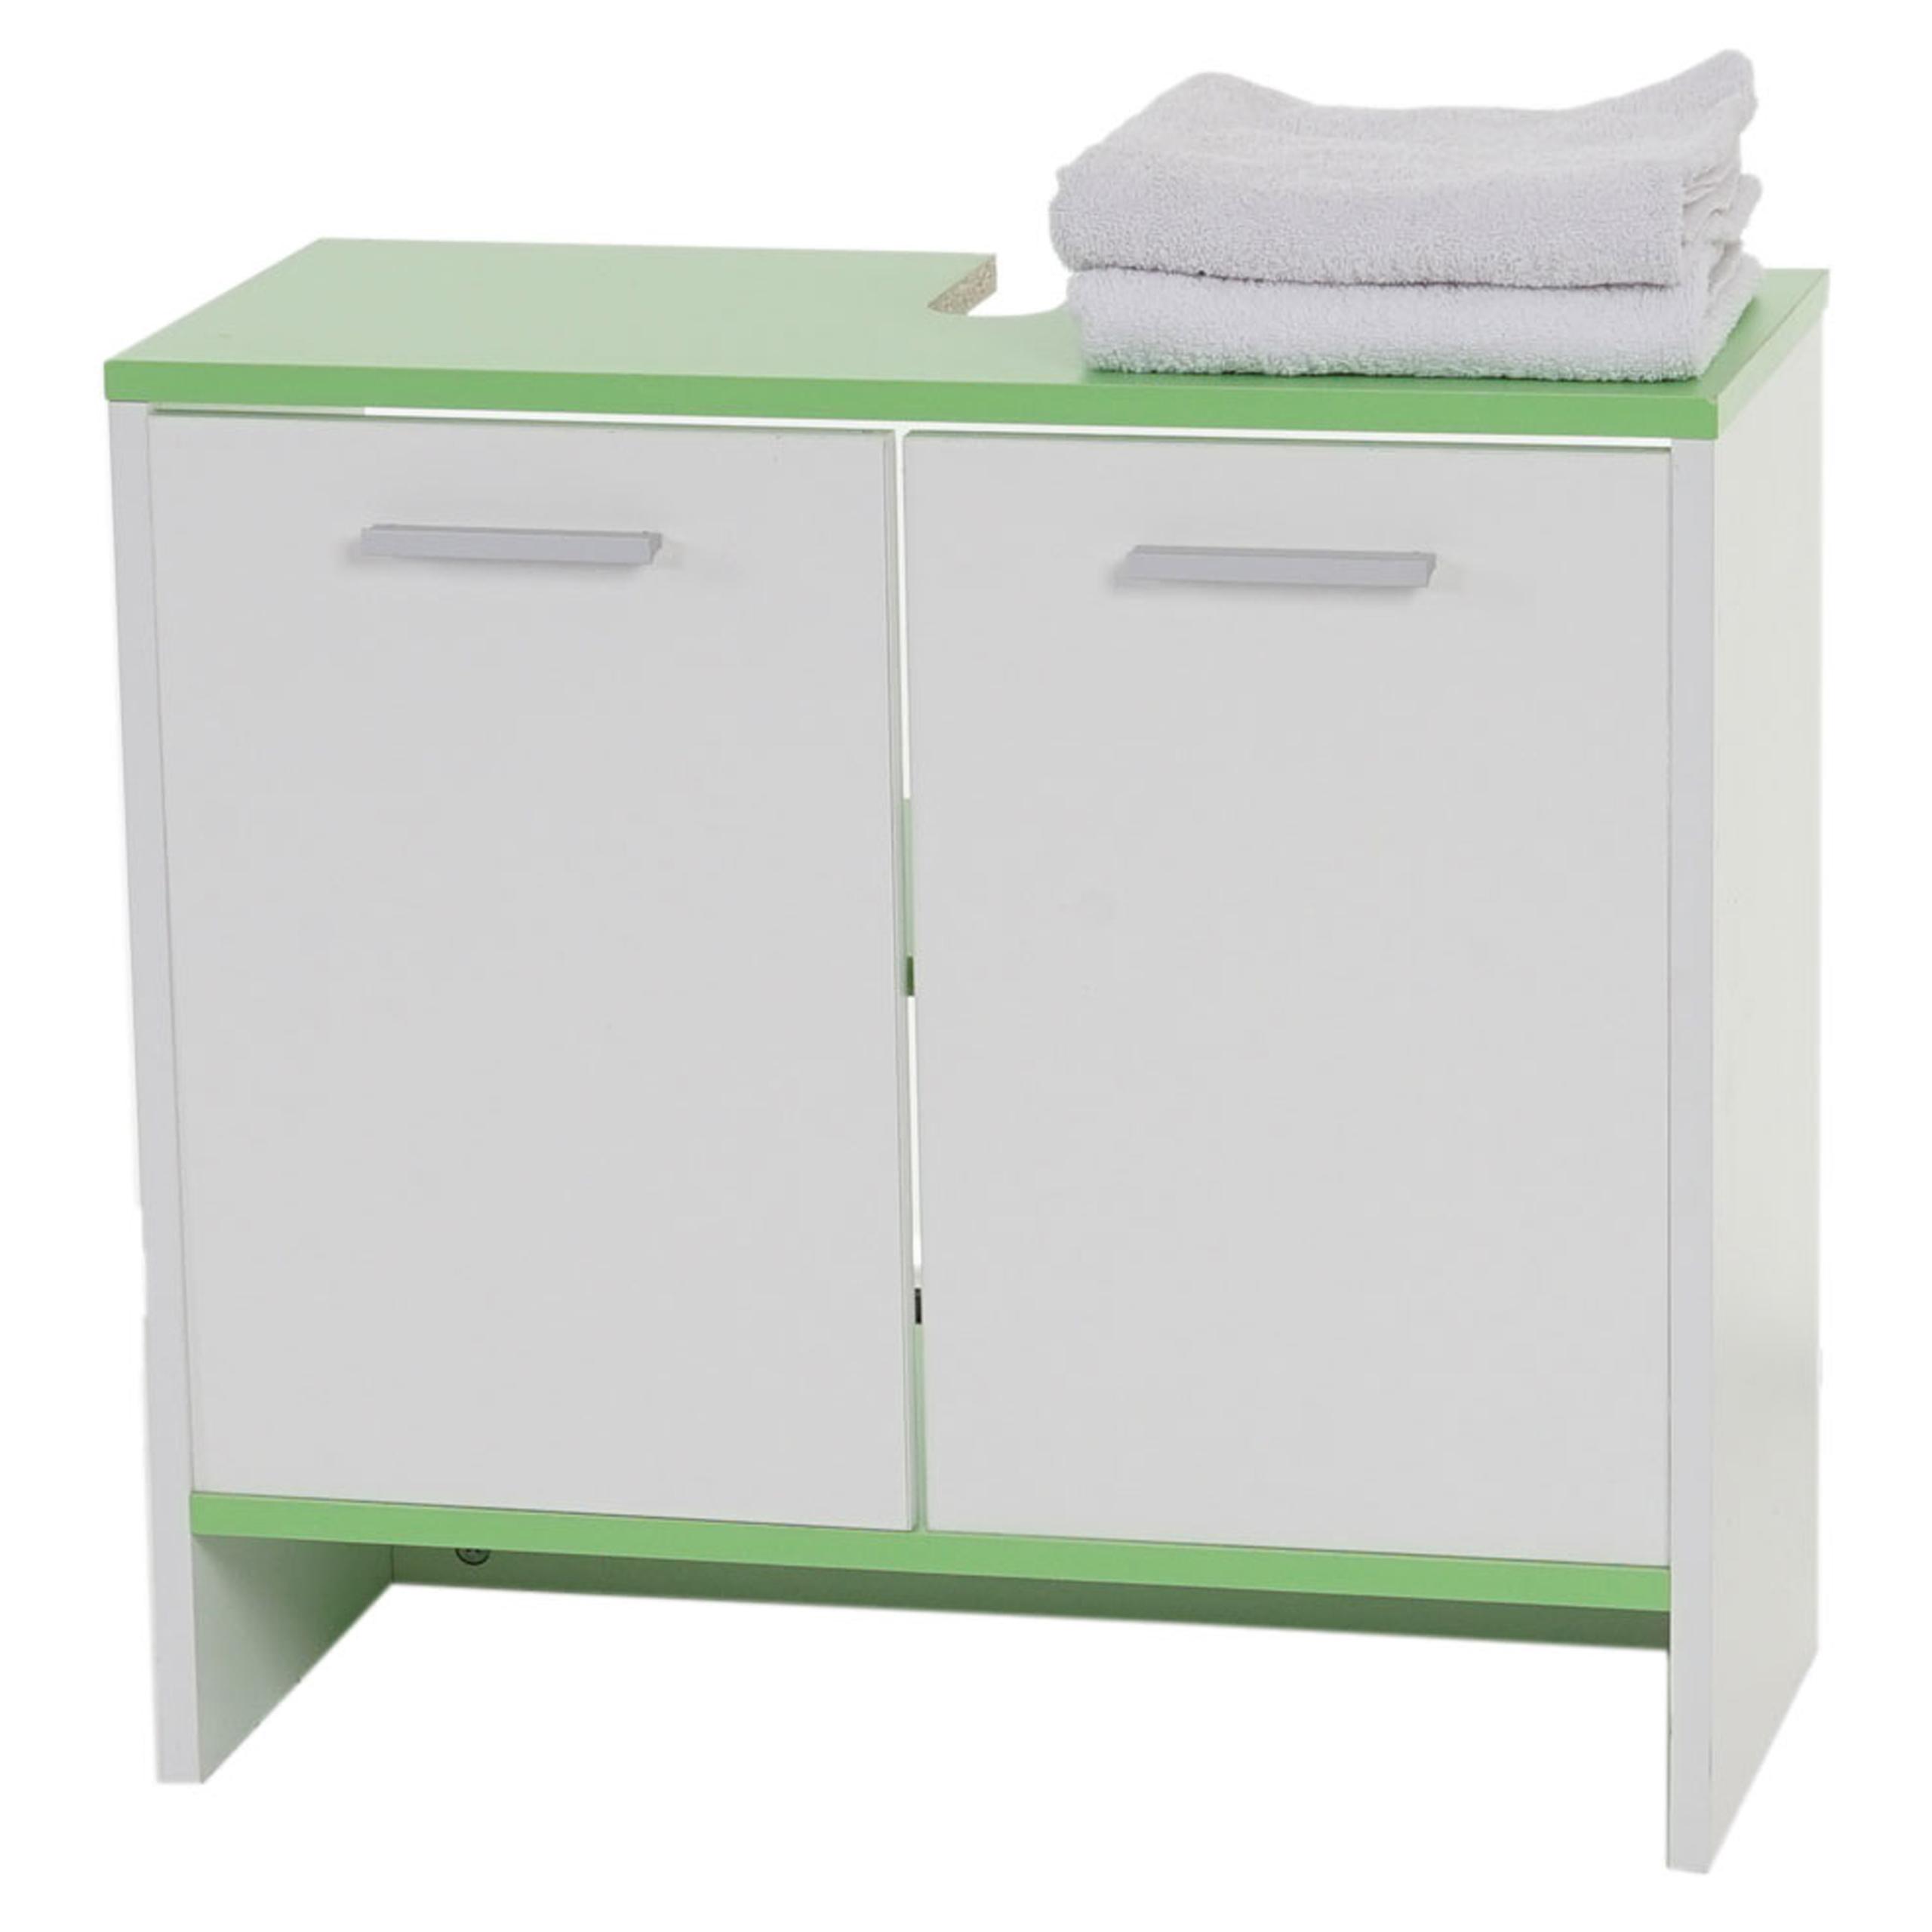 waschbeckenunterschrank massivholz. Black Bedroom Furniture Sets. Home Design Ideas